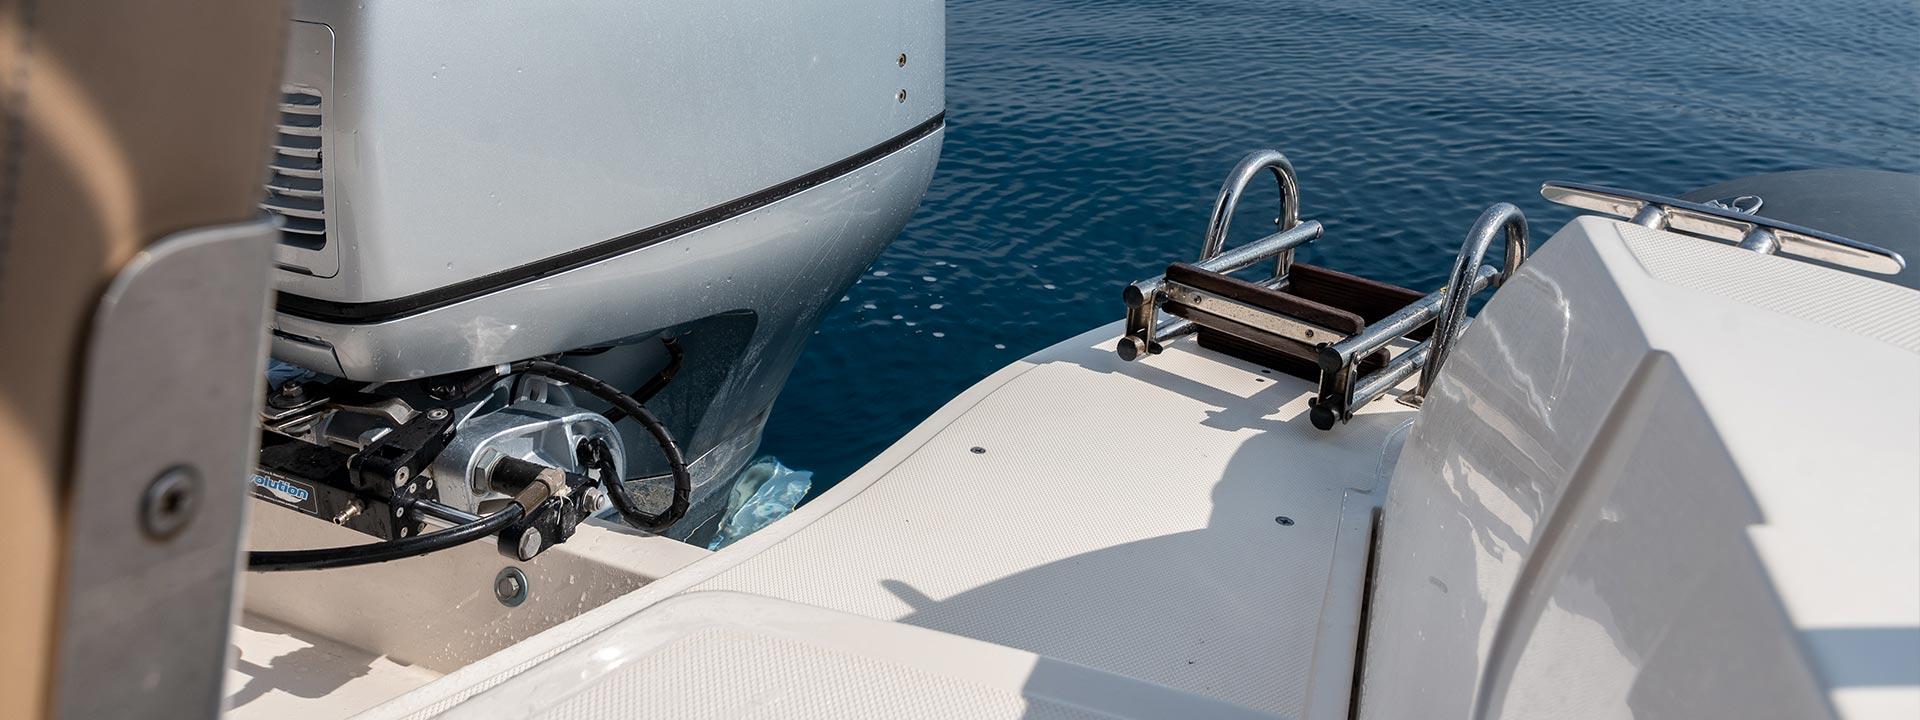 mayer-charter-boat-header-bwa-gto-sport-26-05